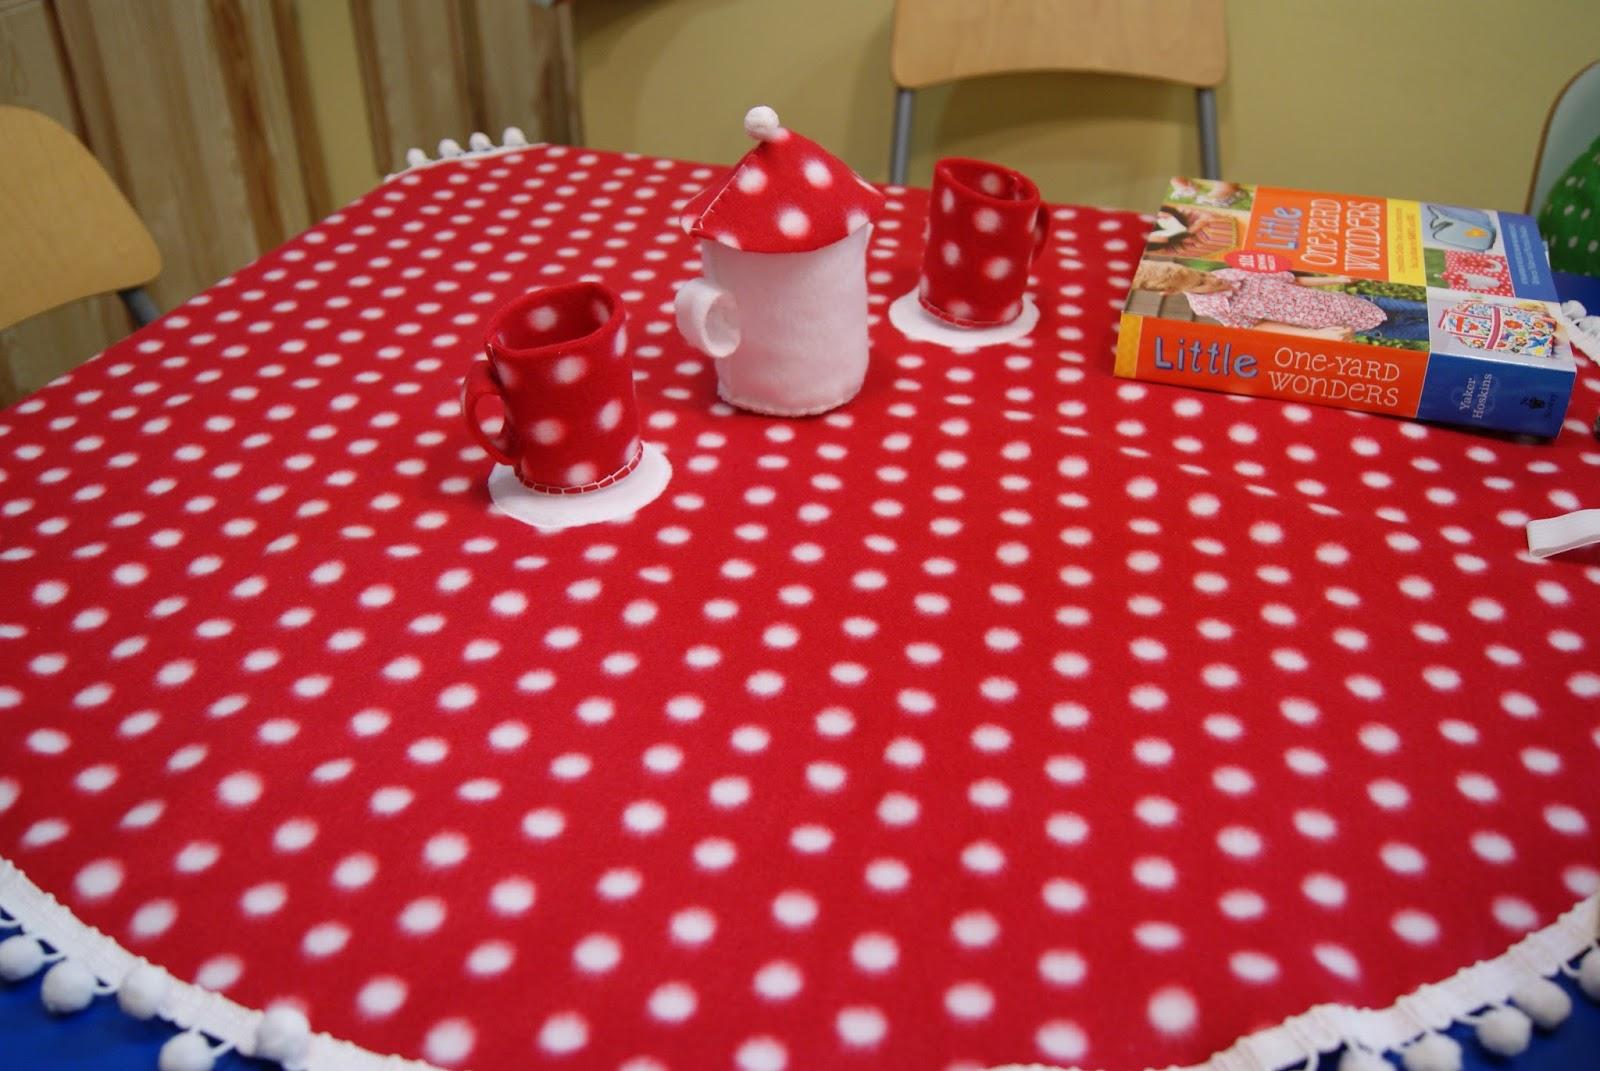 Mushroom Tea Party, Little One-Yard Wonders book release party